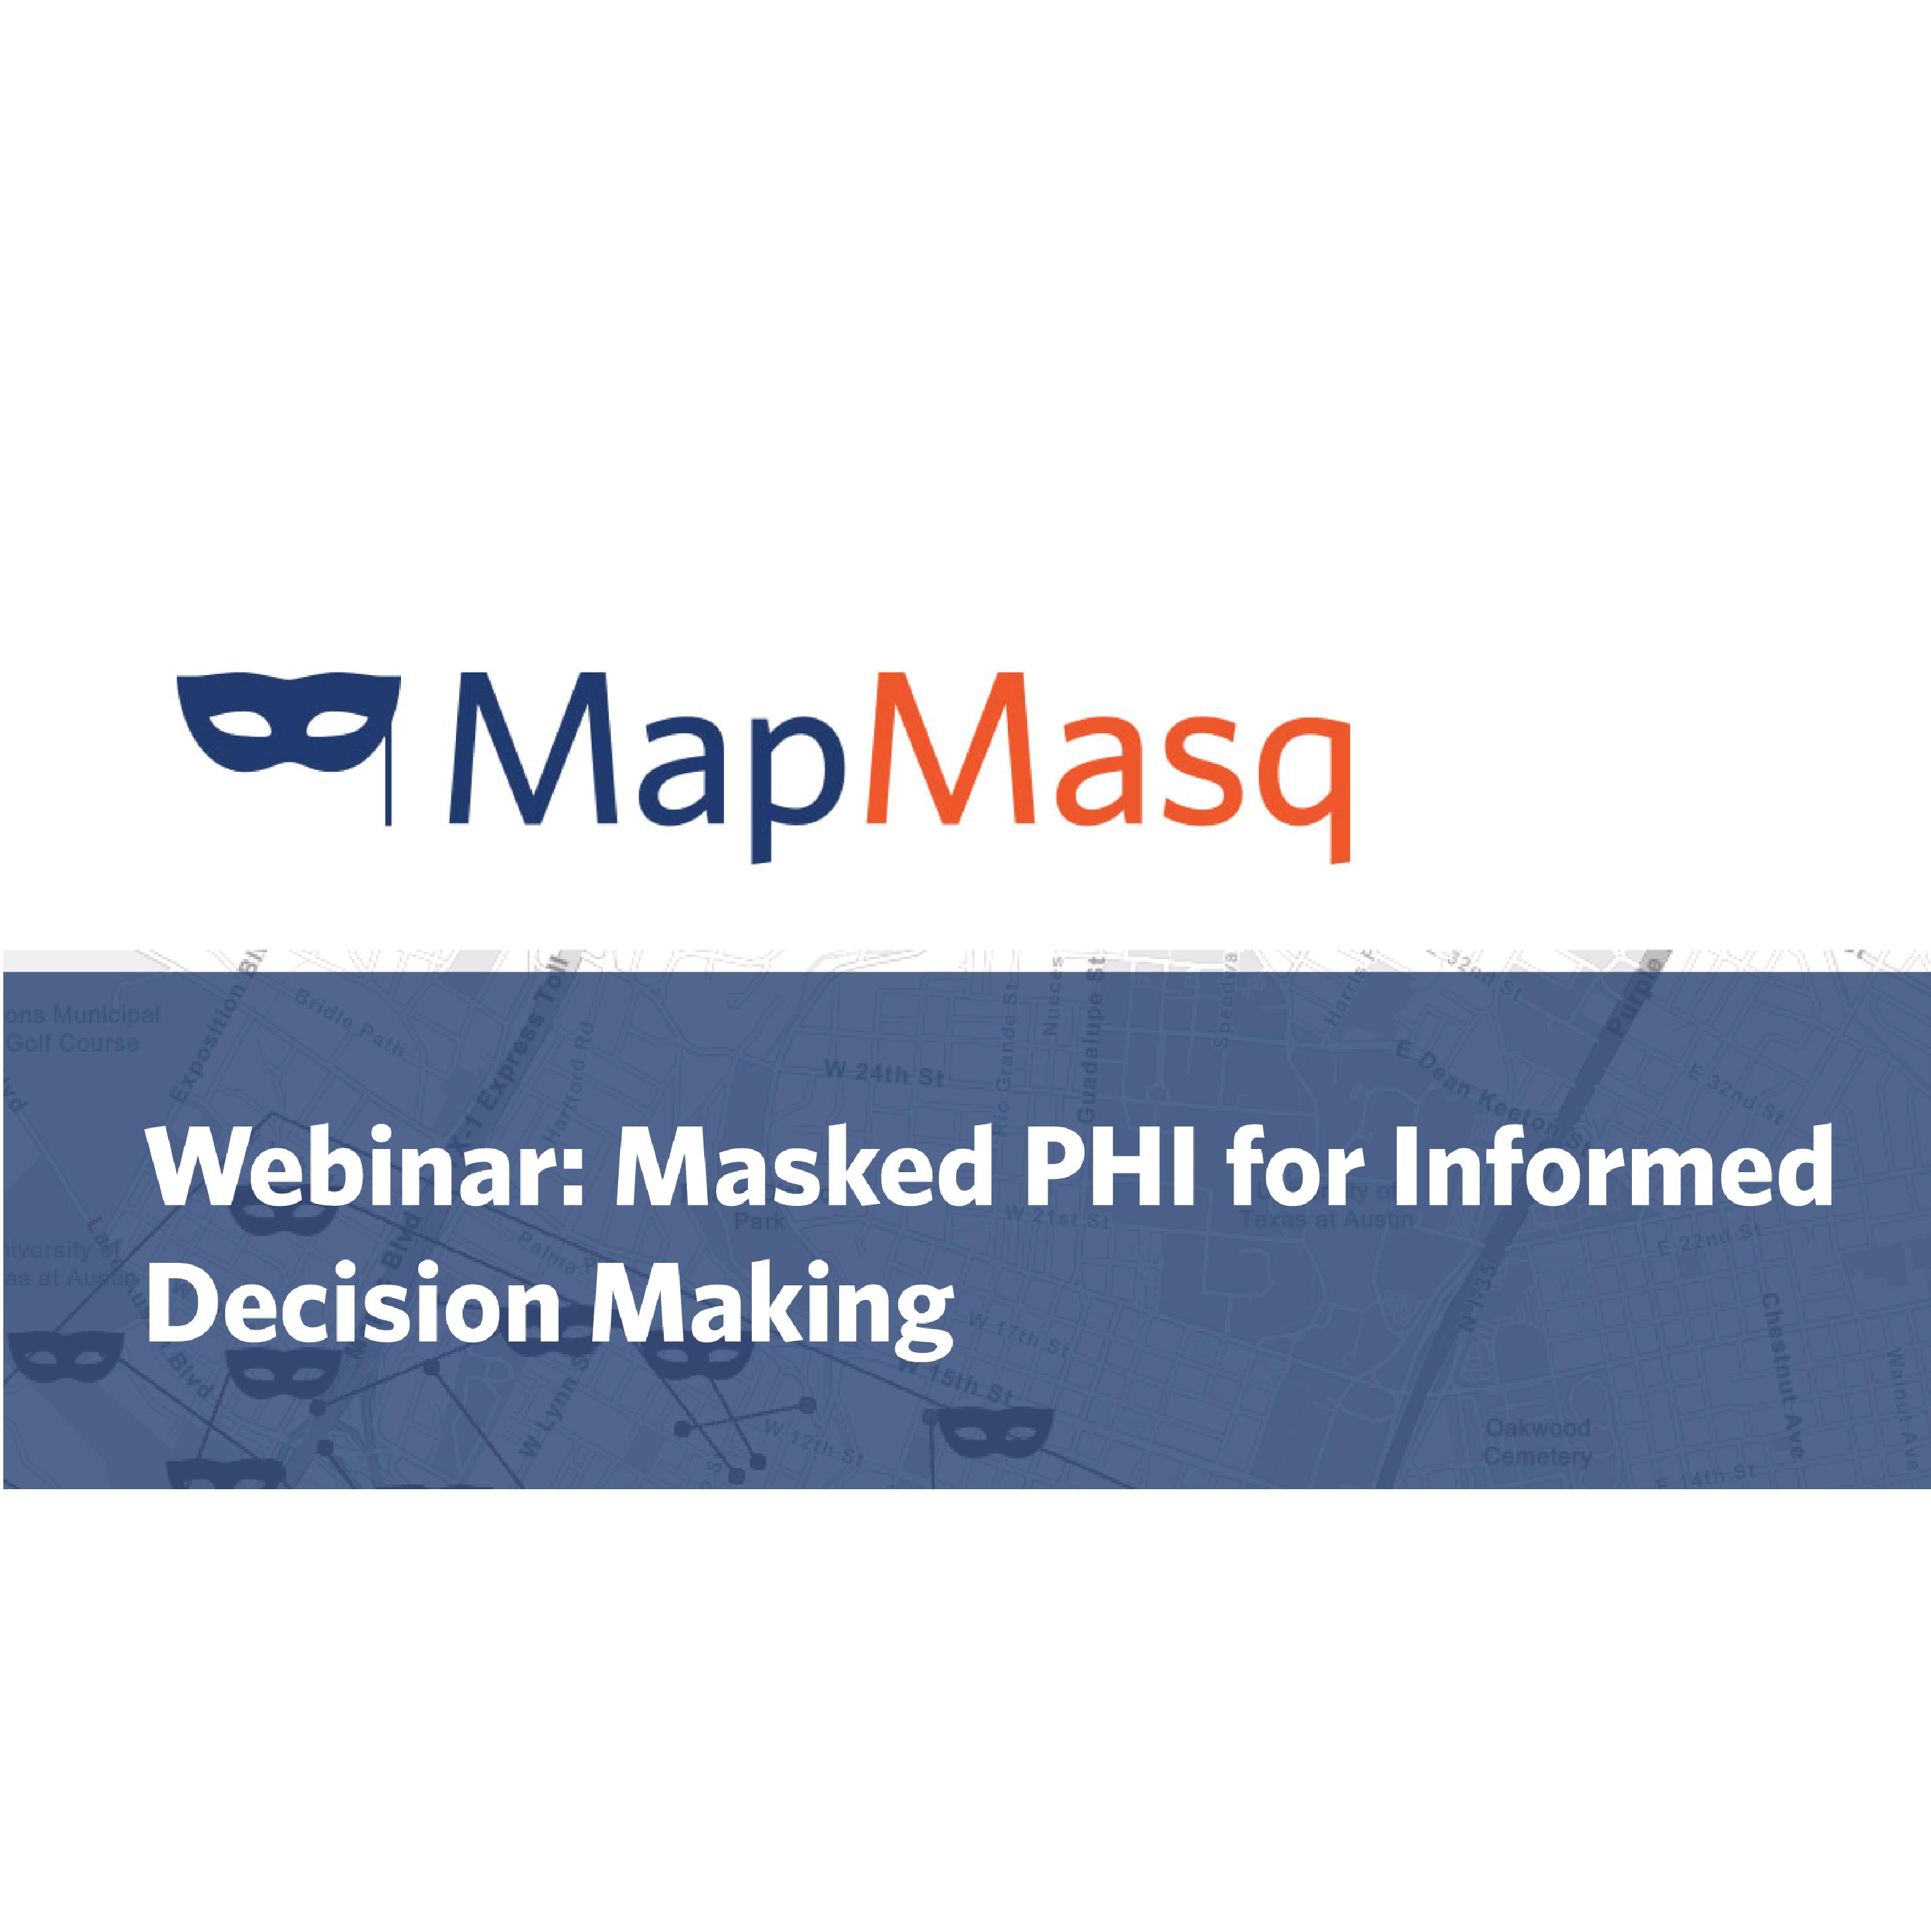 MapMasq: Masked PHI for Informed Decision Making image